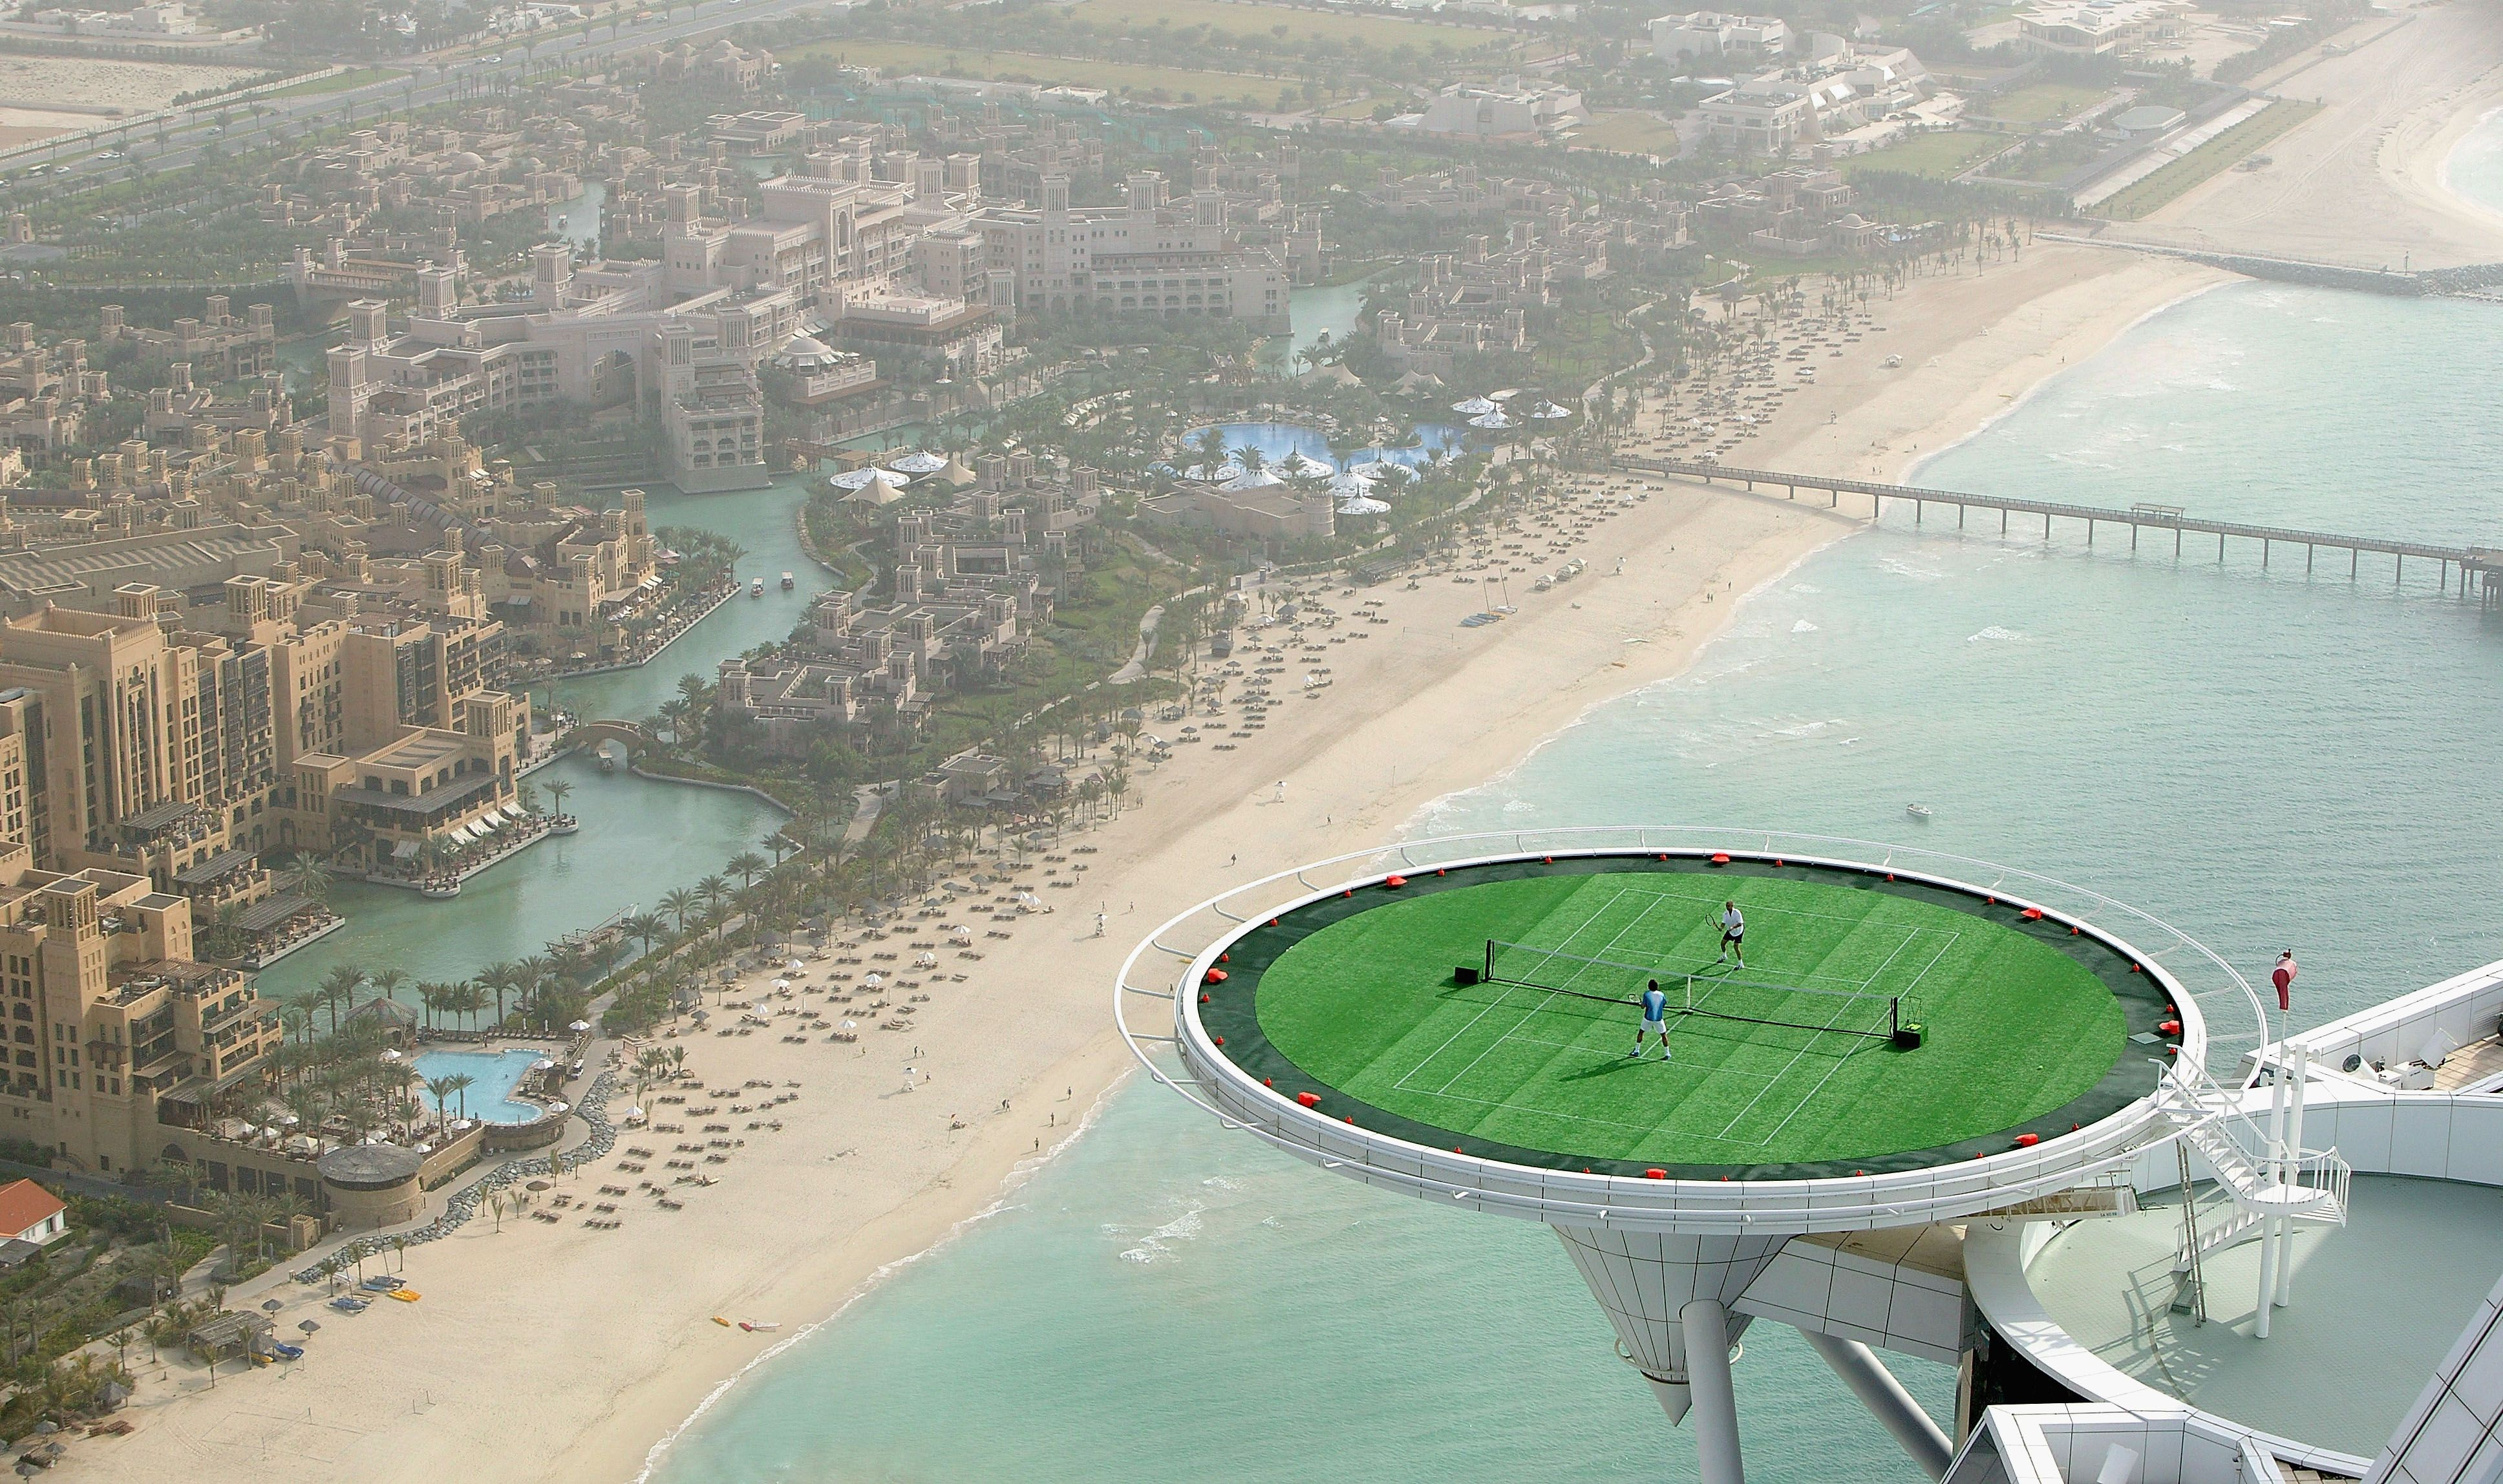 Tennis Court Helipad On The Roof Of Seven Star Burj Al Arab Hotel